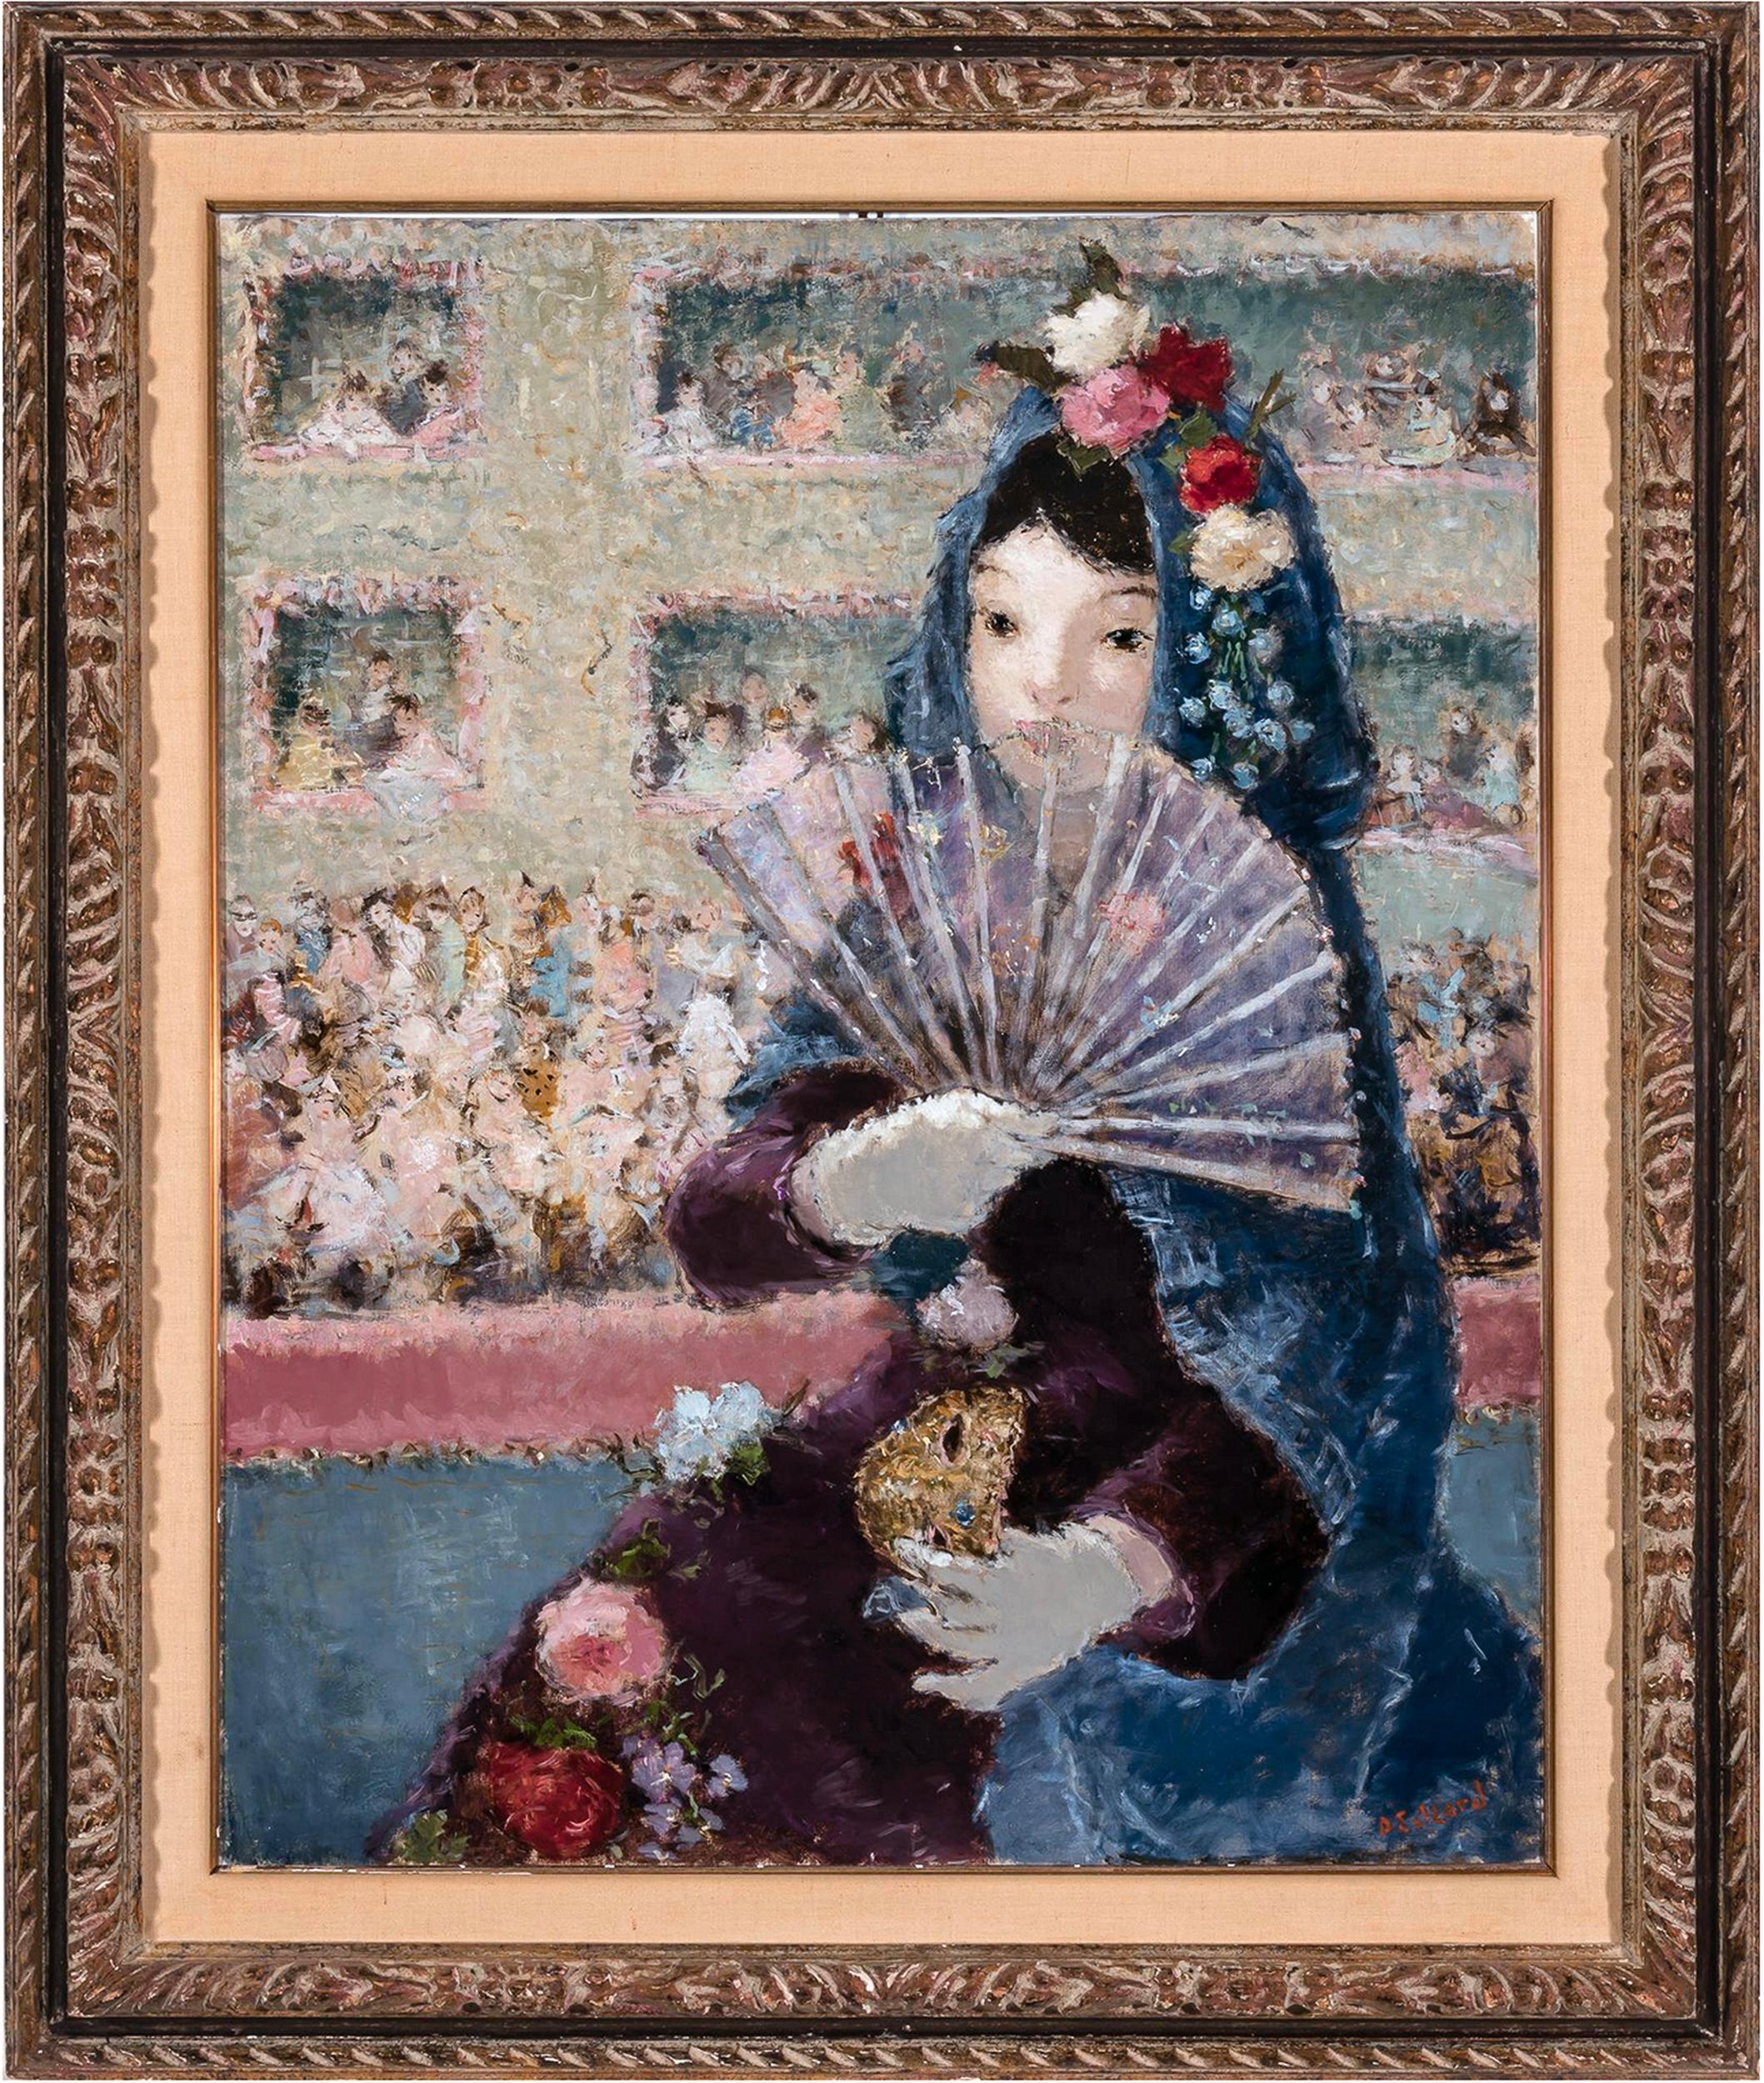 Au Bal Masque - Spanish girl at Opera - Like Degas